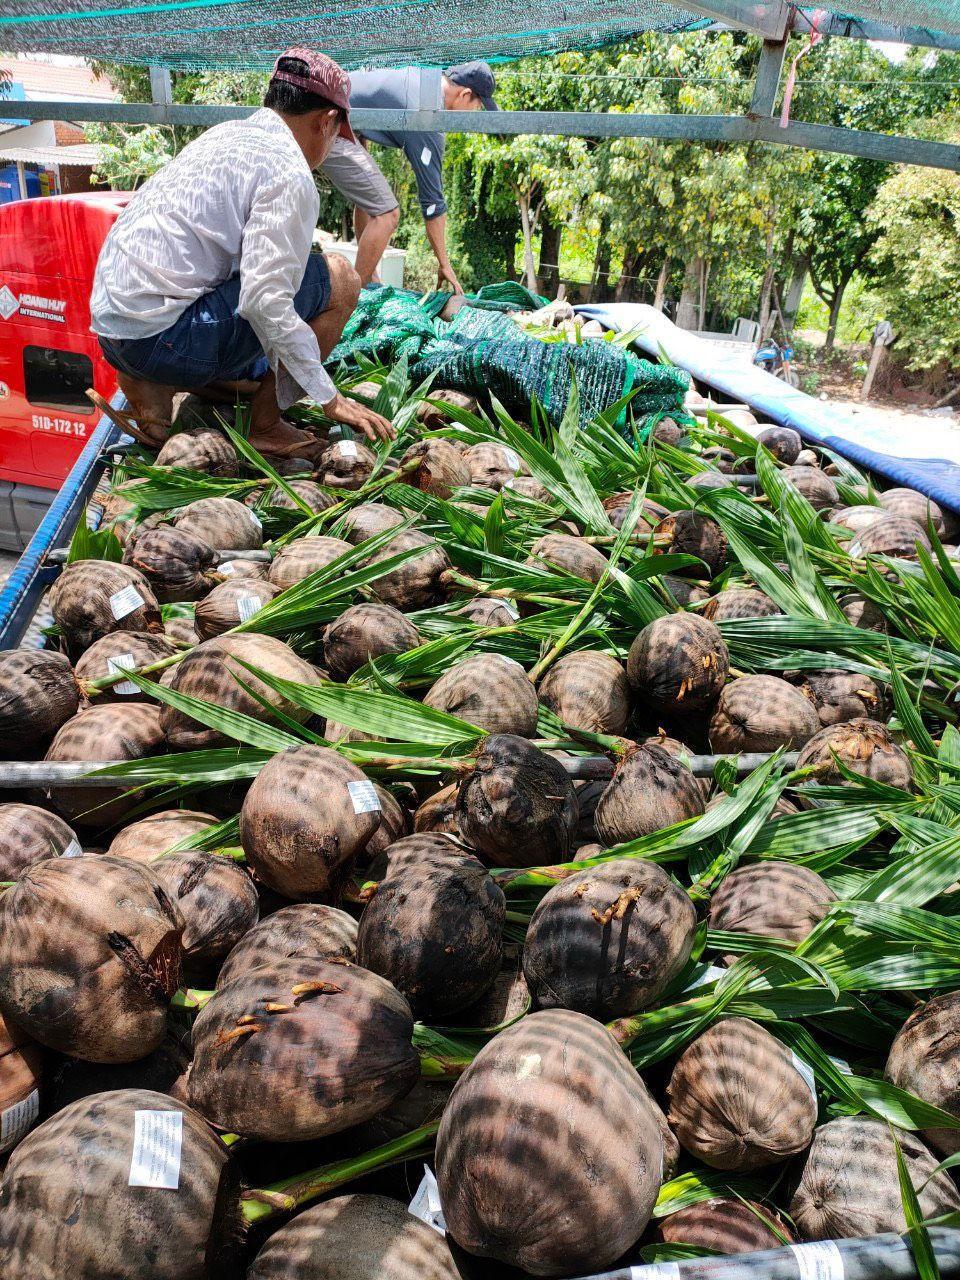 COCONUT SEEDLING TREE, COCONUT PALM TREE SEEDLING 2020